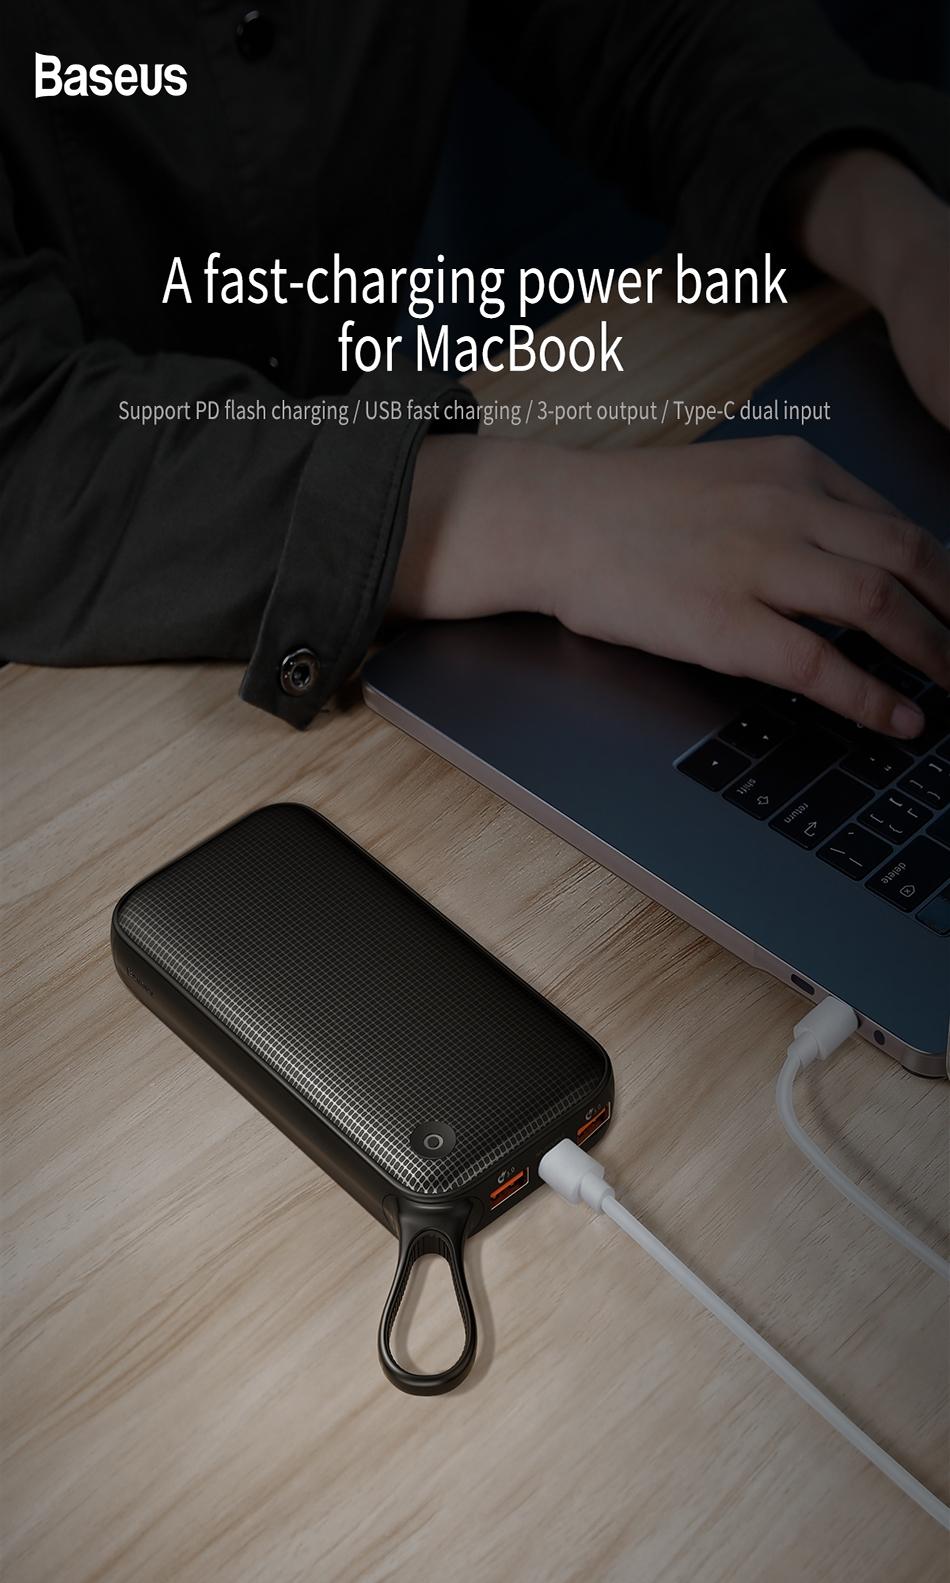 Baseus Powerful Portable 20000mAh QC3.0 Powerbank Power Bank Dual Usb External Battery Charger